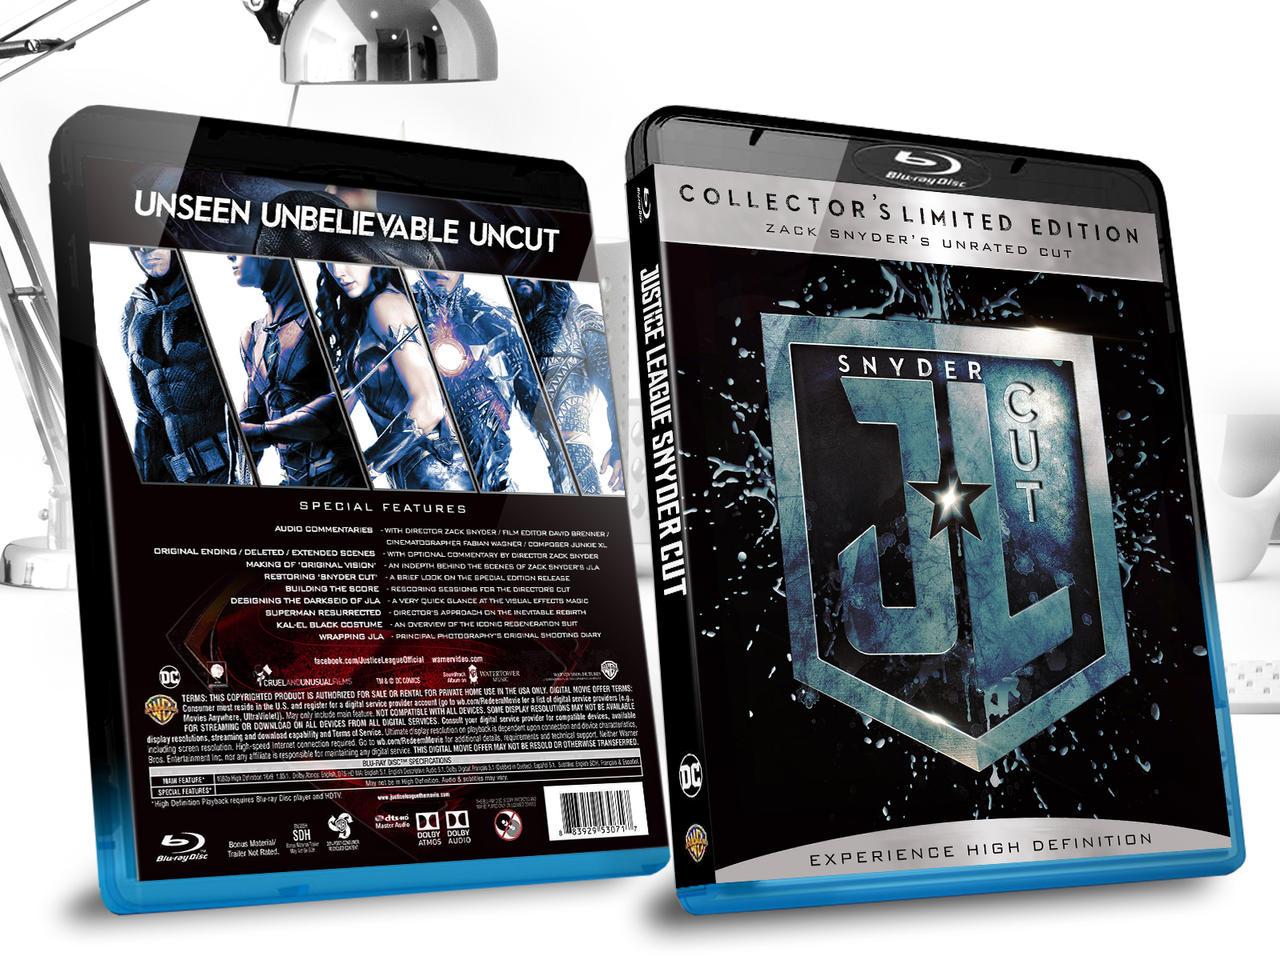 JL Snydercut Blu-ray by childlogiclabs